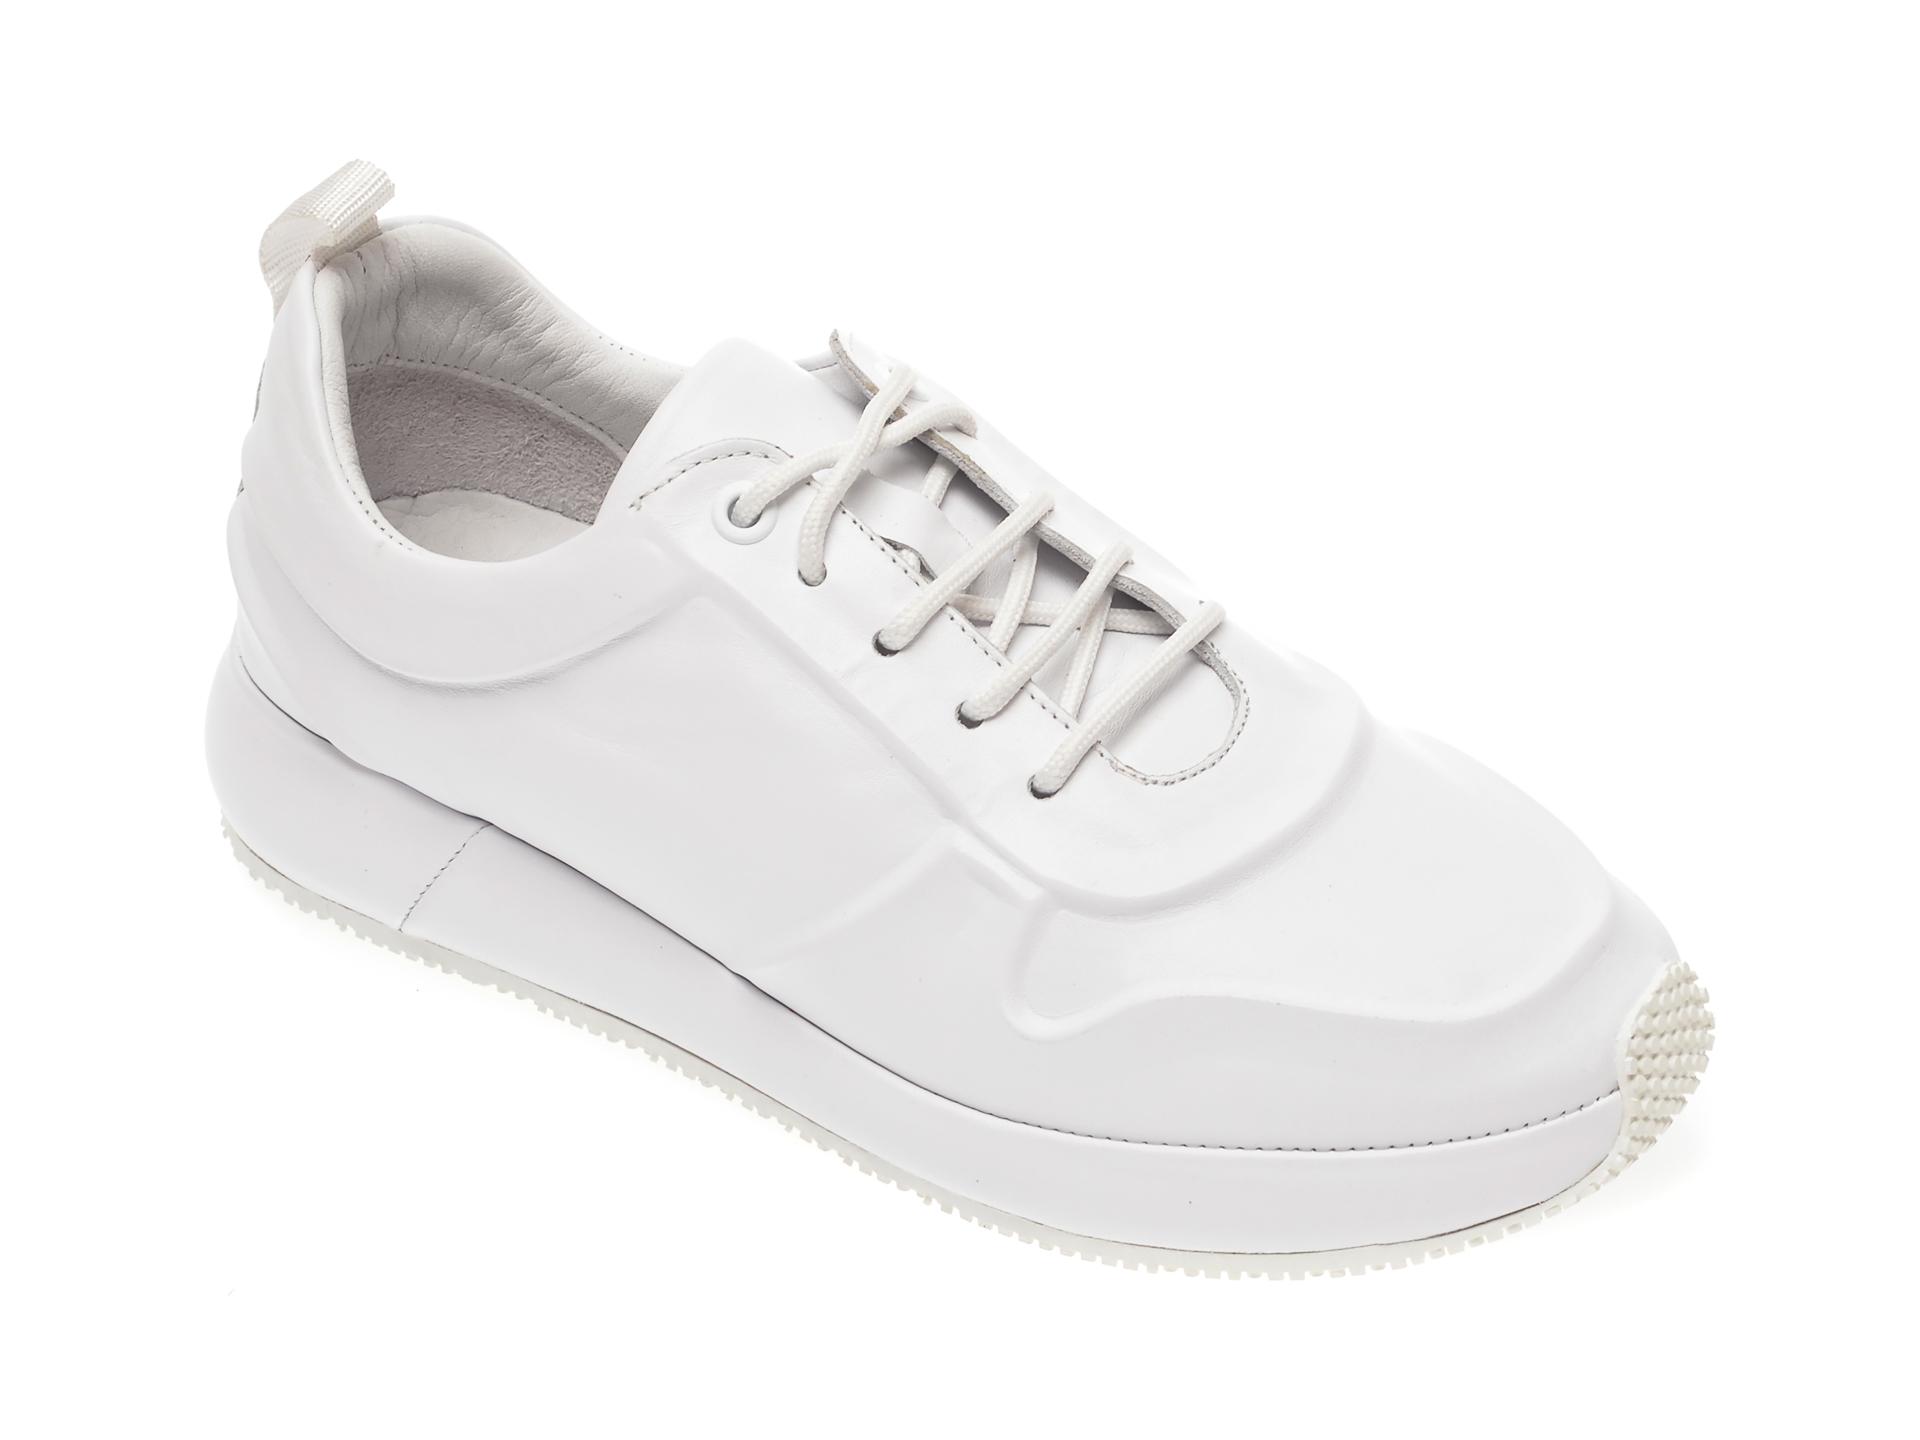 Pantofi FLAVIA PASSINI albi, 1919019, din piele naturala New